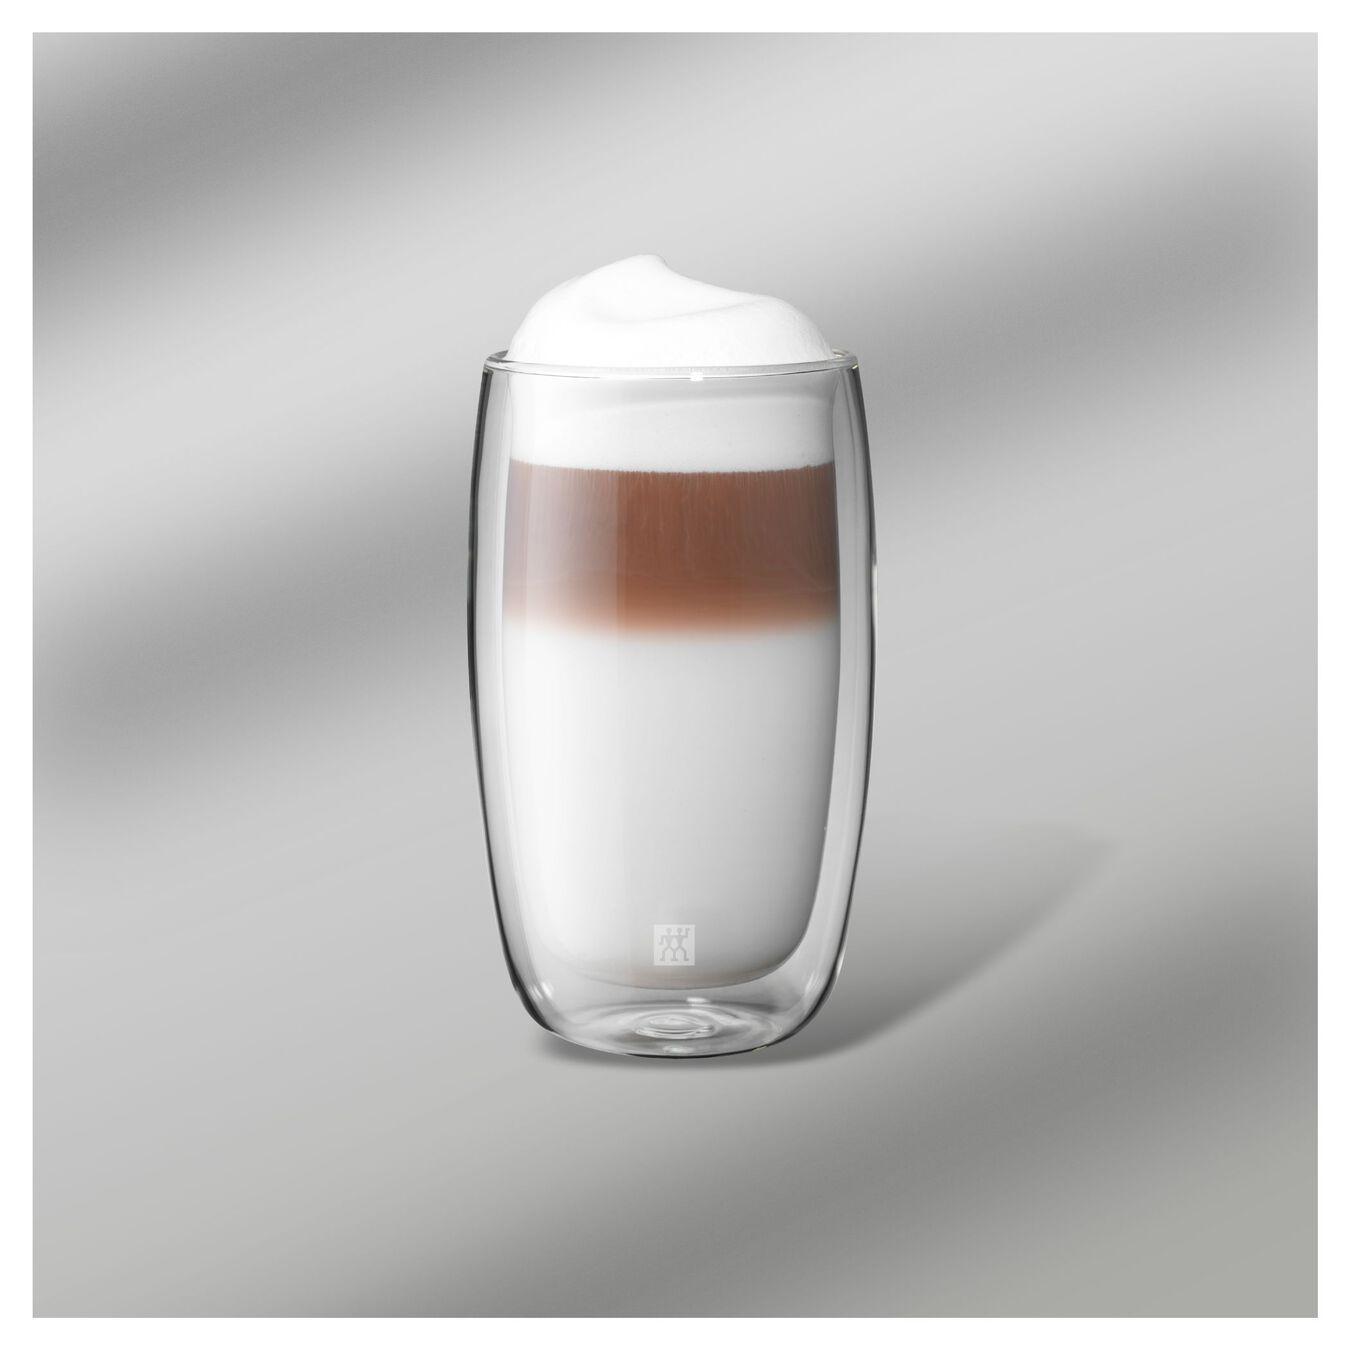 Set di bicchieri da latte - 2-pz., vetro borosilicato,,large 4